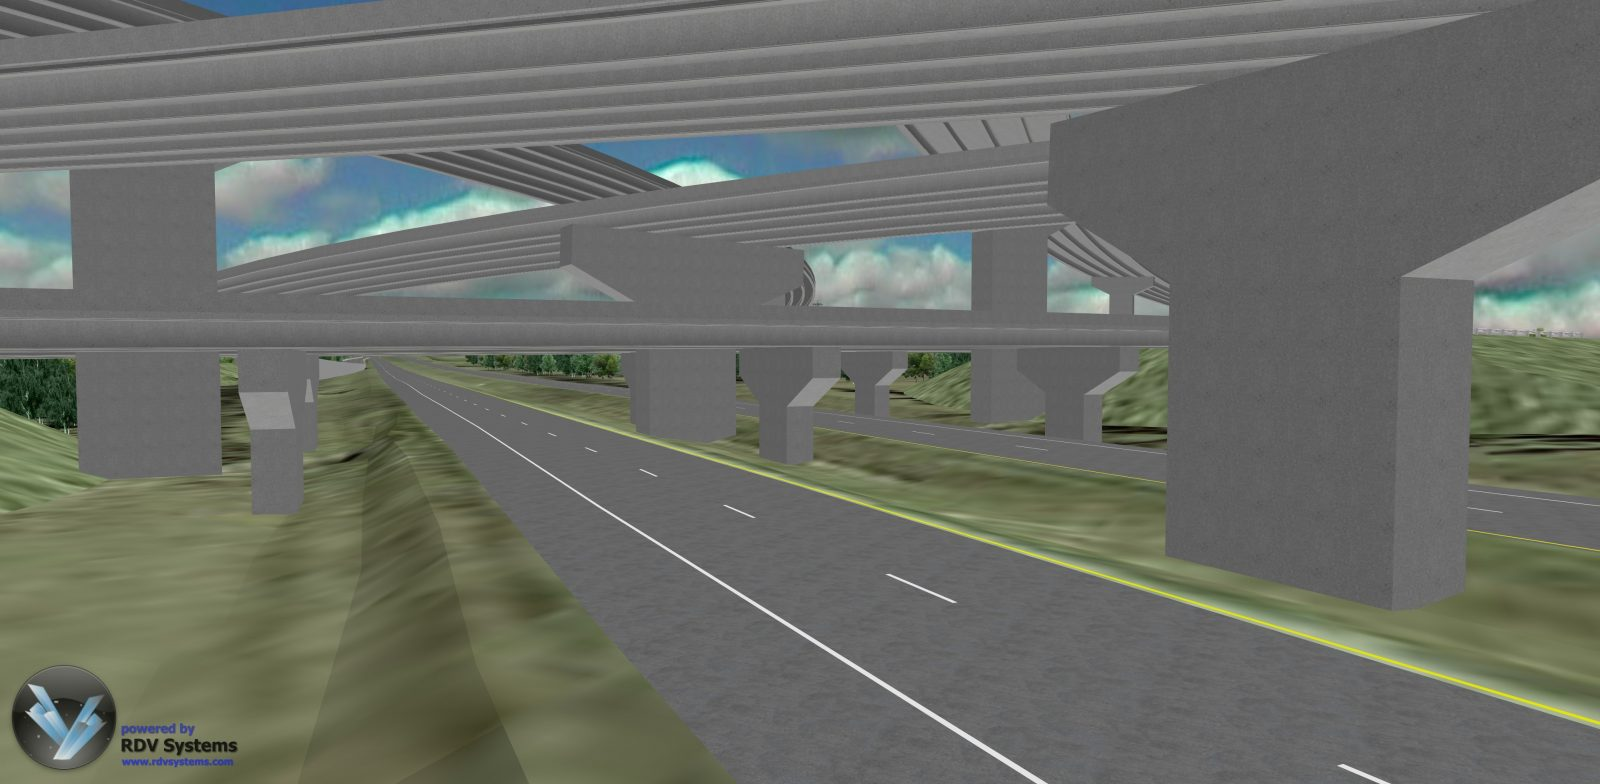 RDV Systems - I-65 Interchange 3